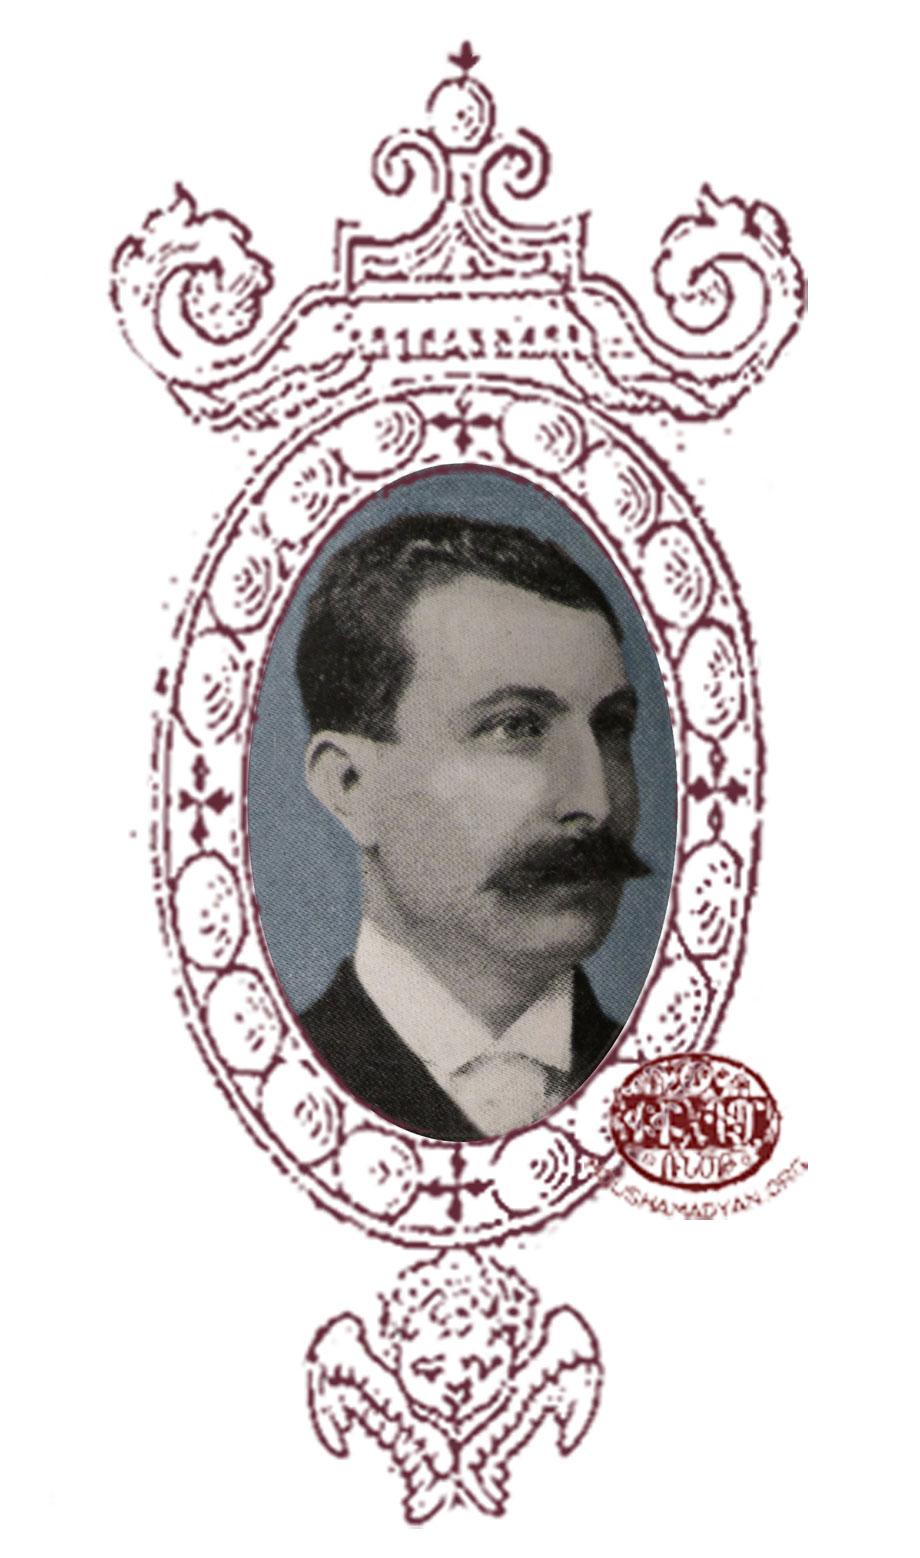 Hovhannes Garabedyan